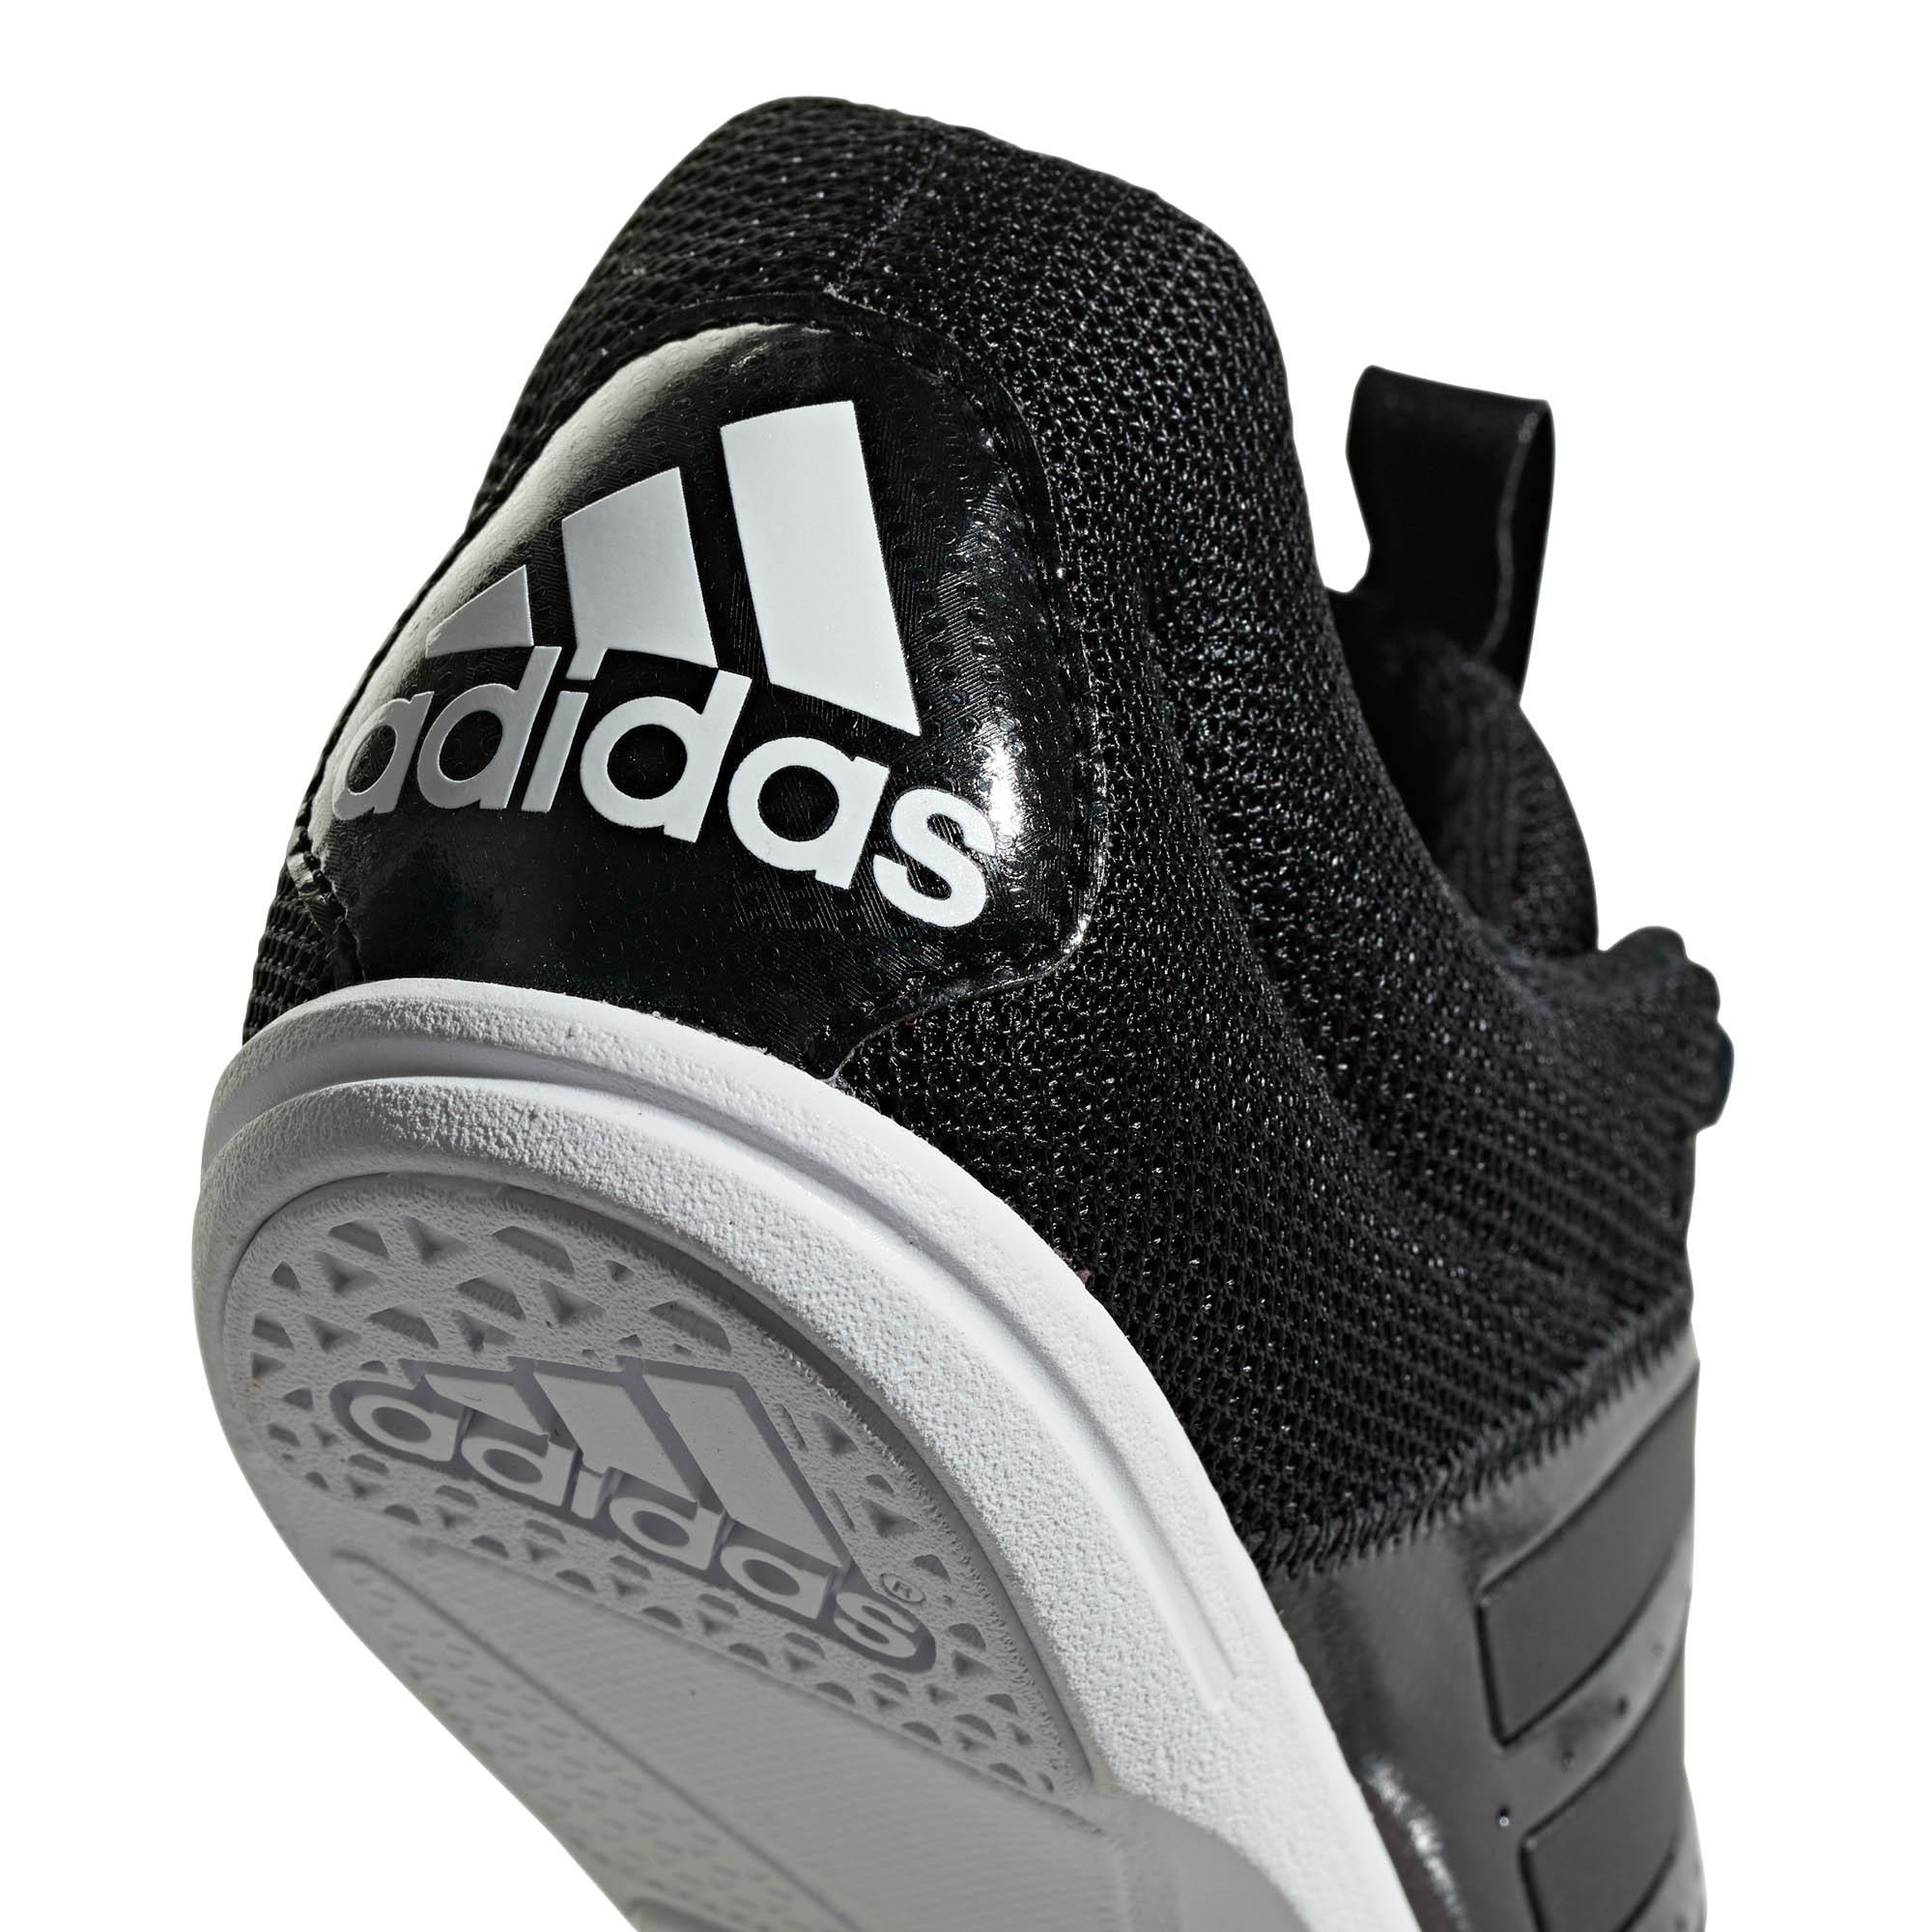 8aa3eb98584f7b Adidas Allroundstar Kinder Laufschuhe Spike Turnschuhe Schwarz Weiß ...